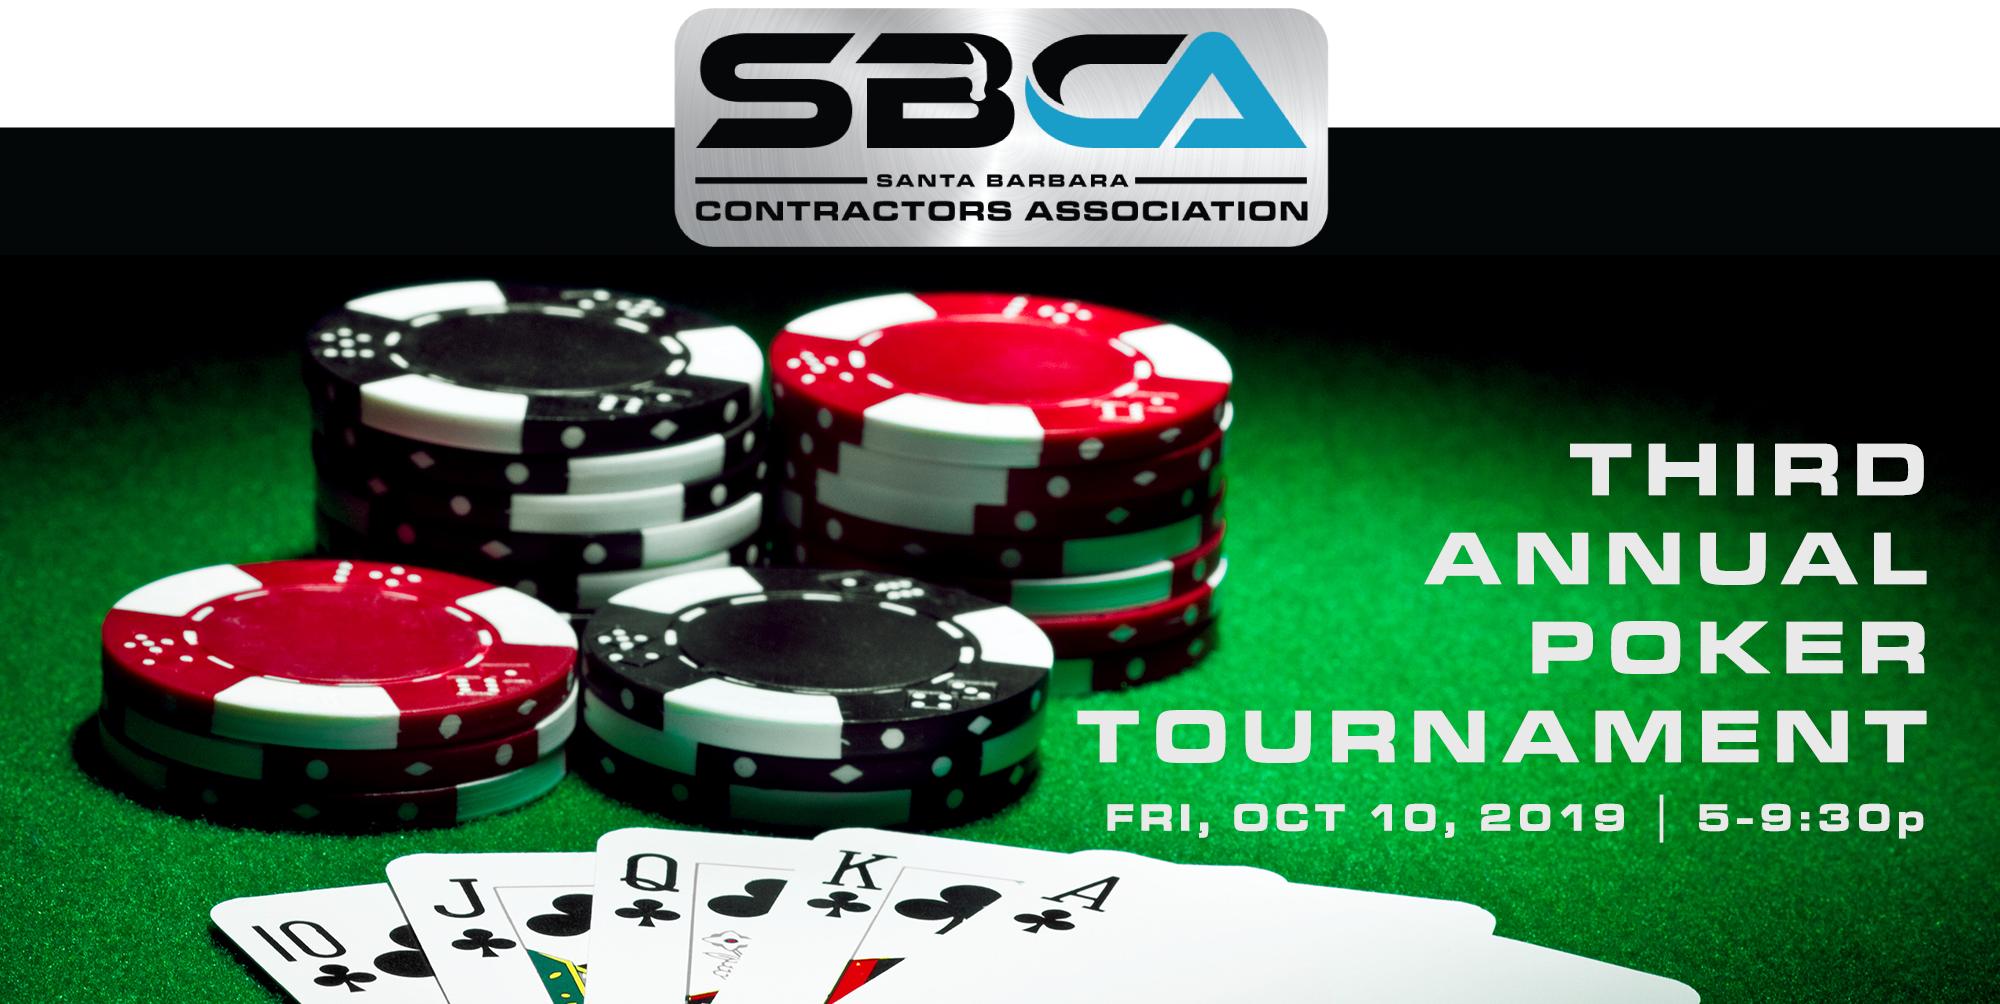 SBCA Poker Tournament 2019